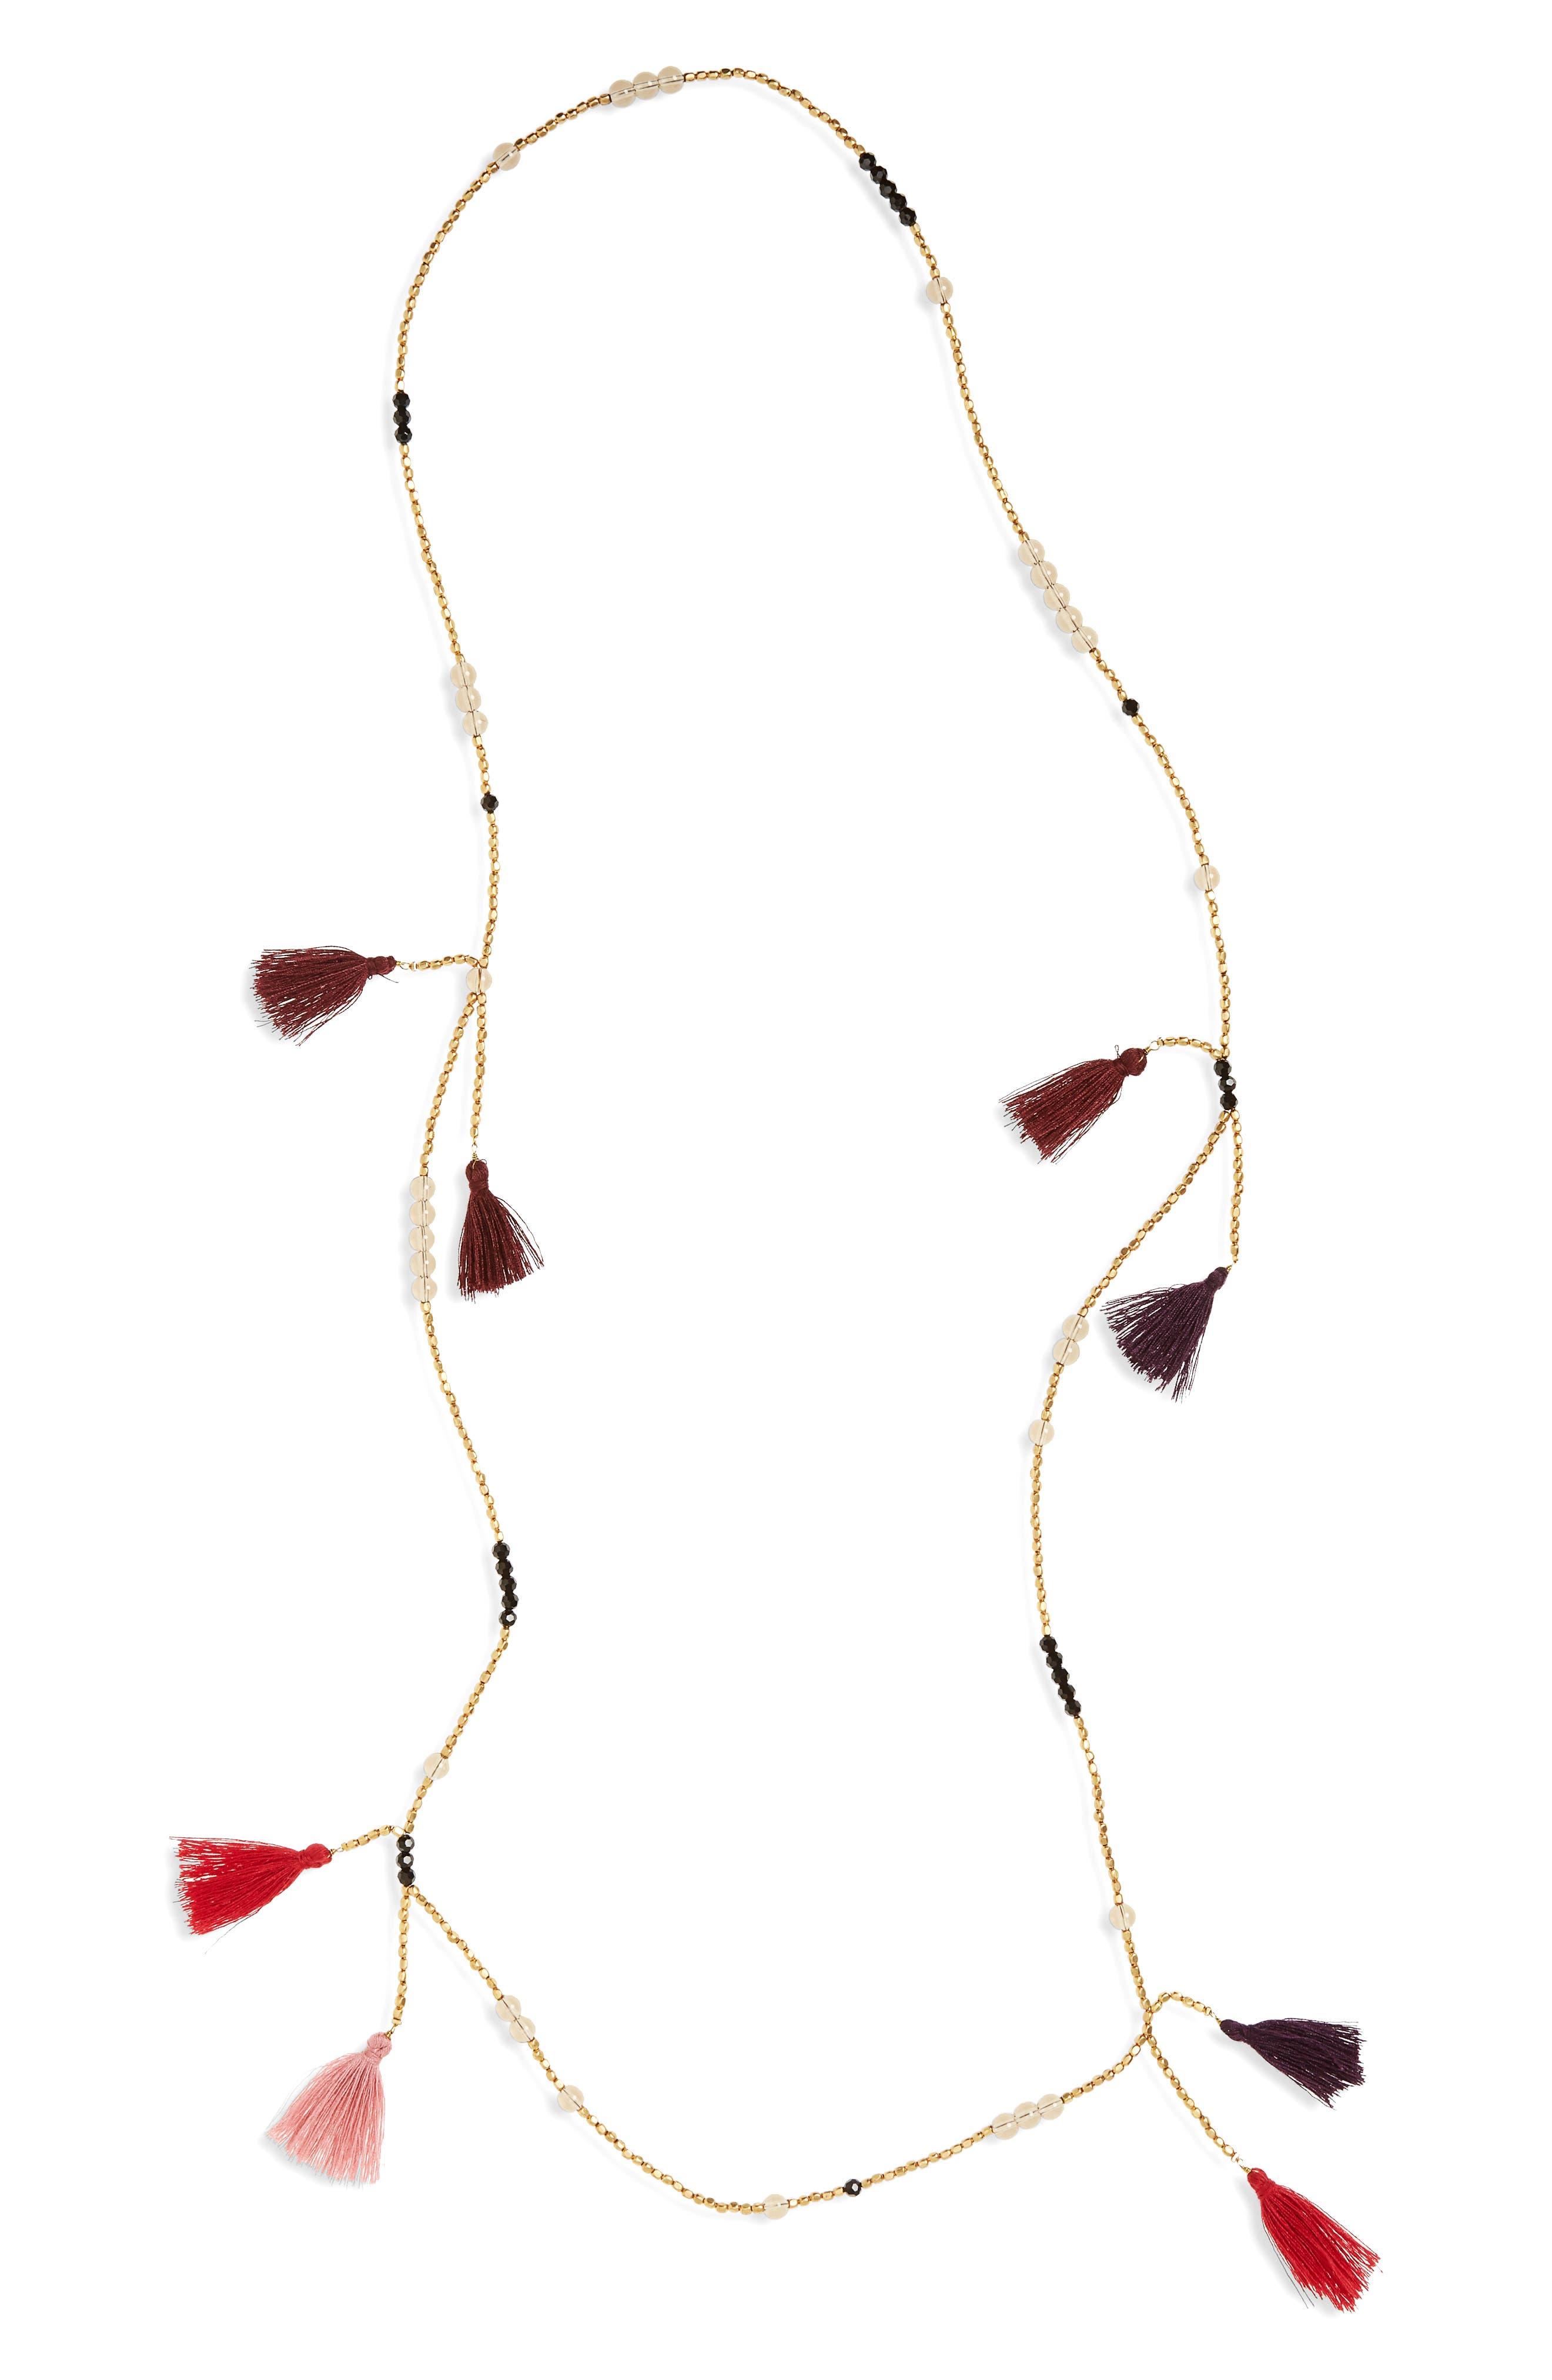 Alternate Image 1 Selected - Panacea Tassel Bead Necklace